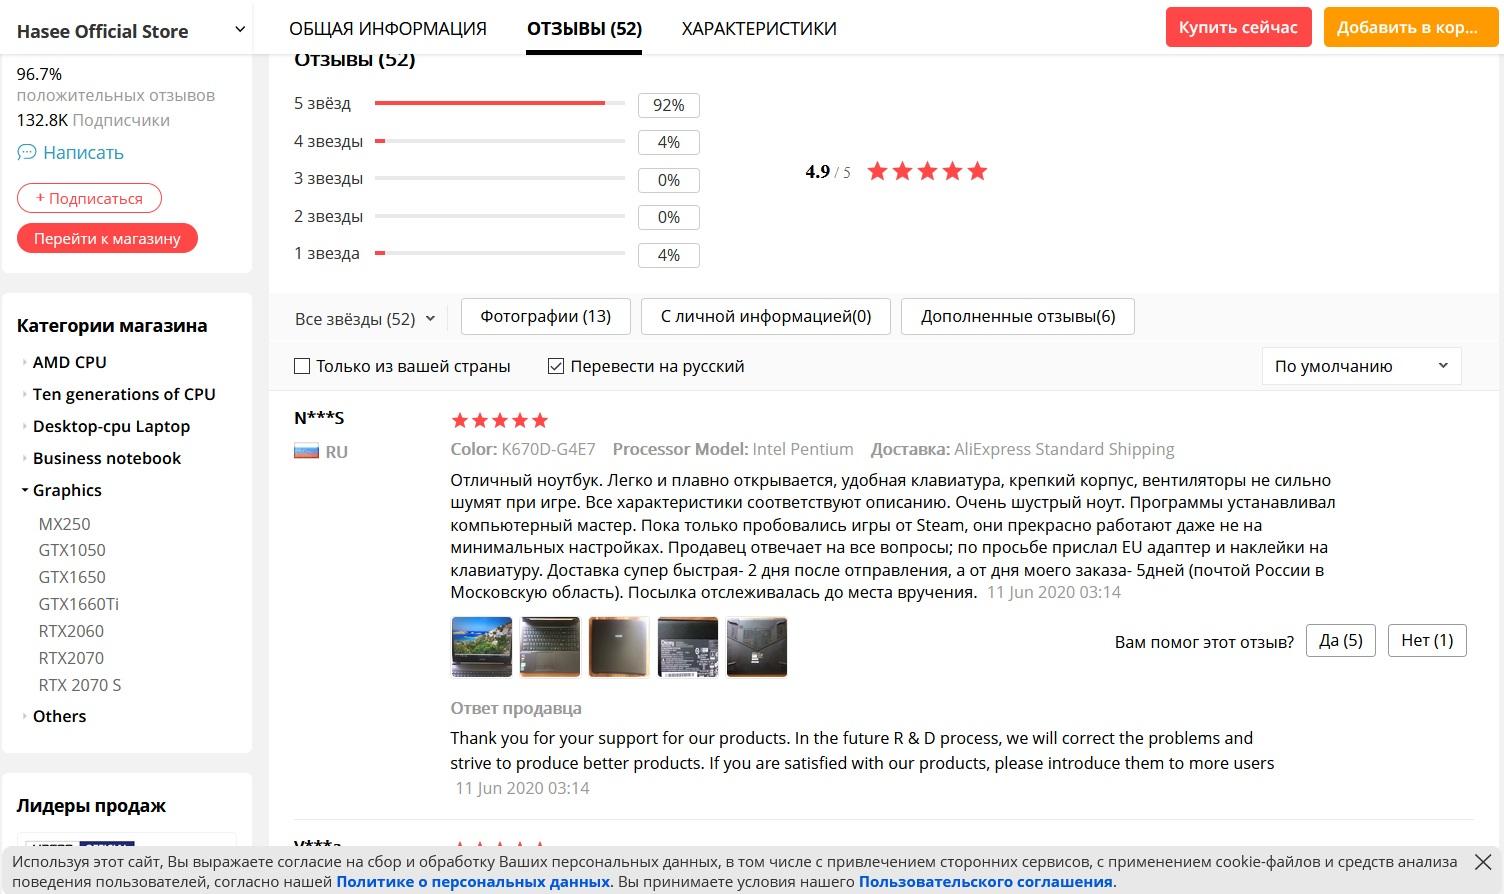 Отзывы о ноутбуке Hasee K670D-G4E7